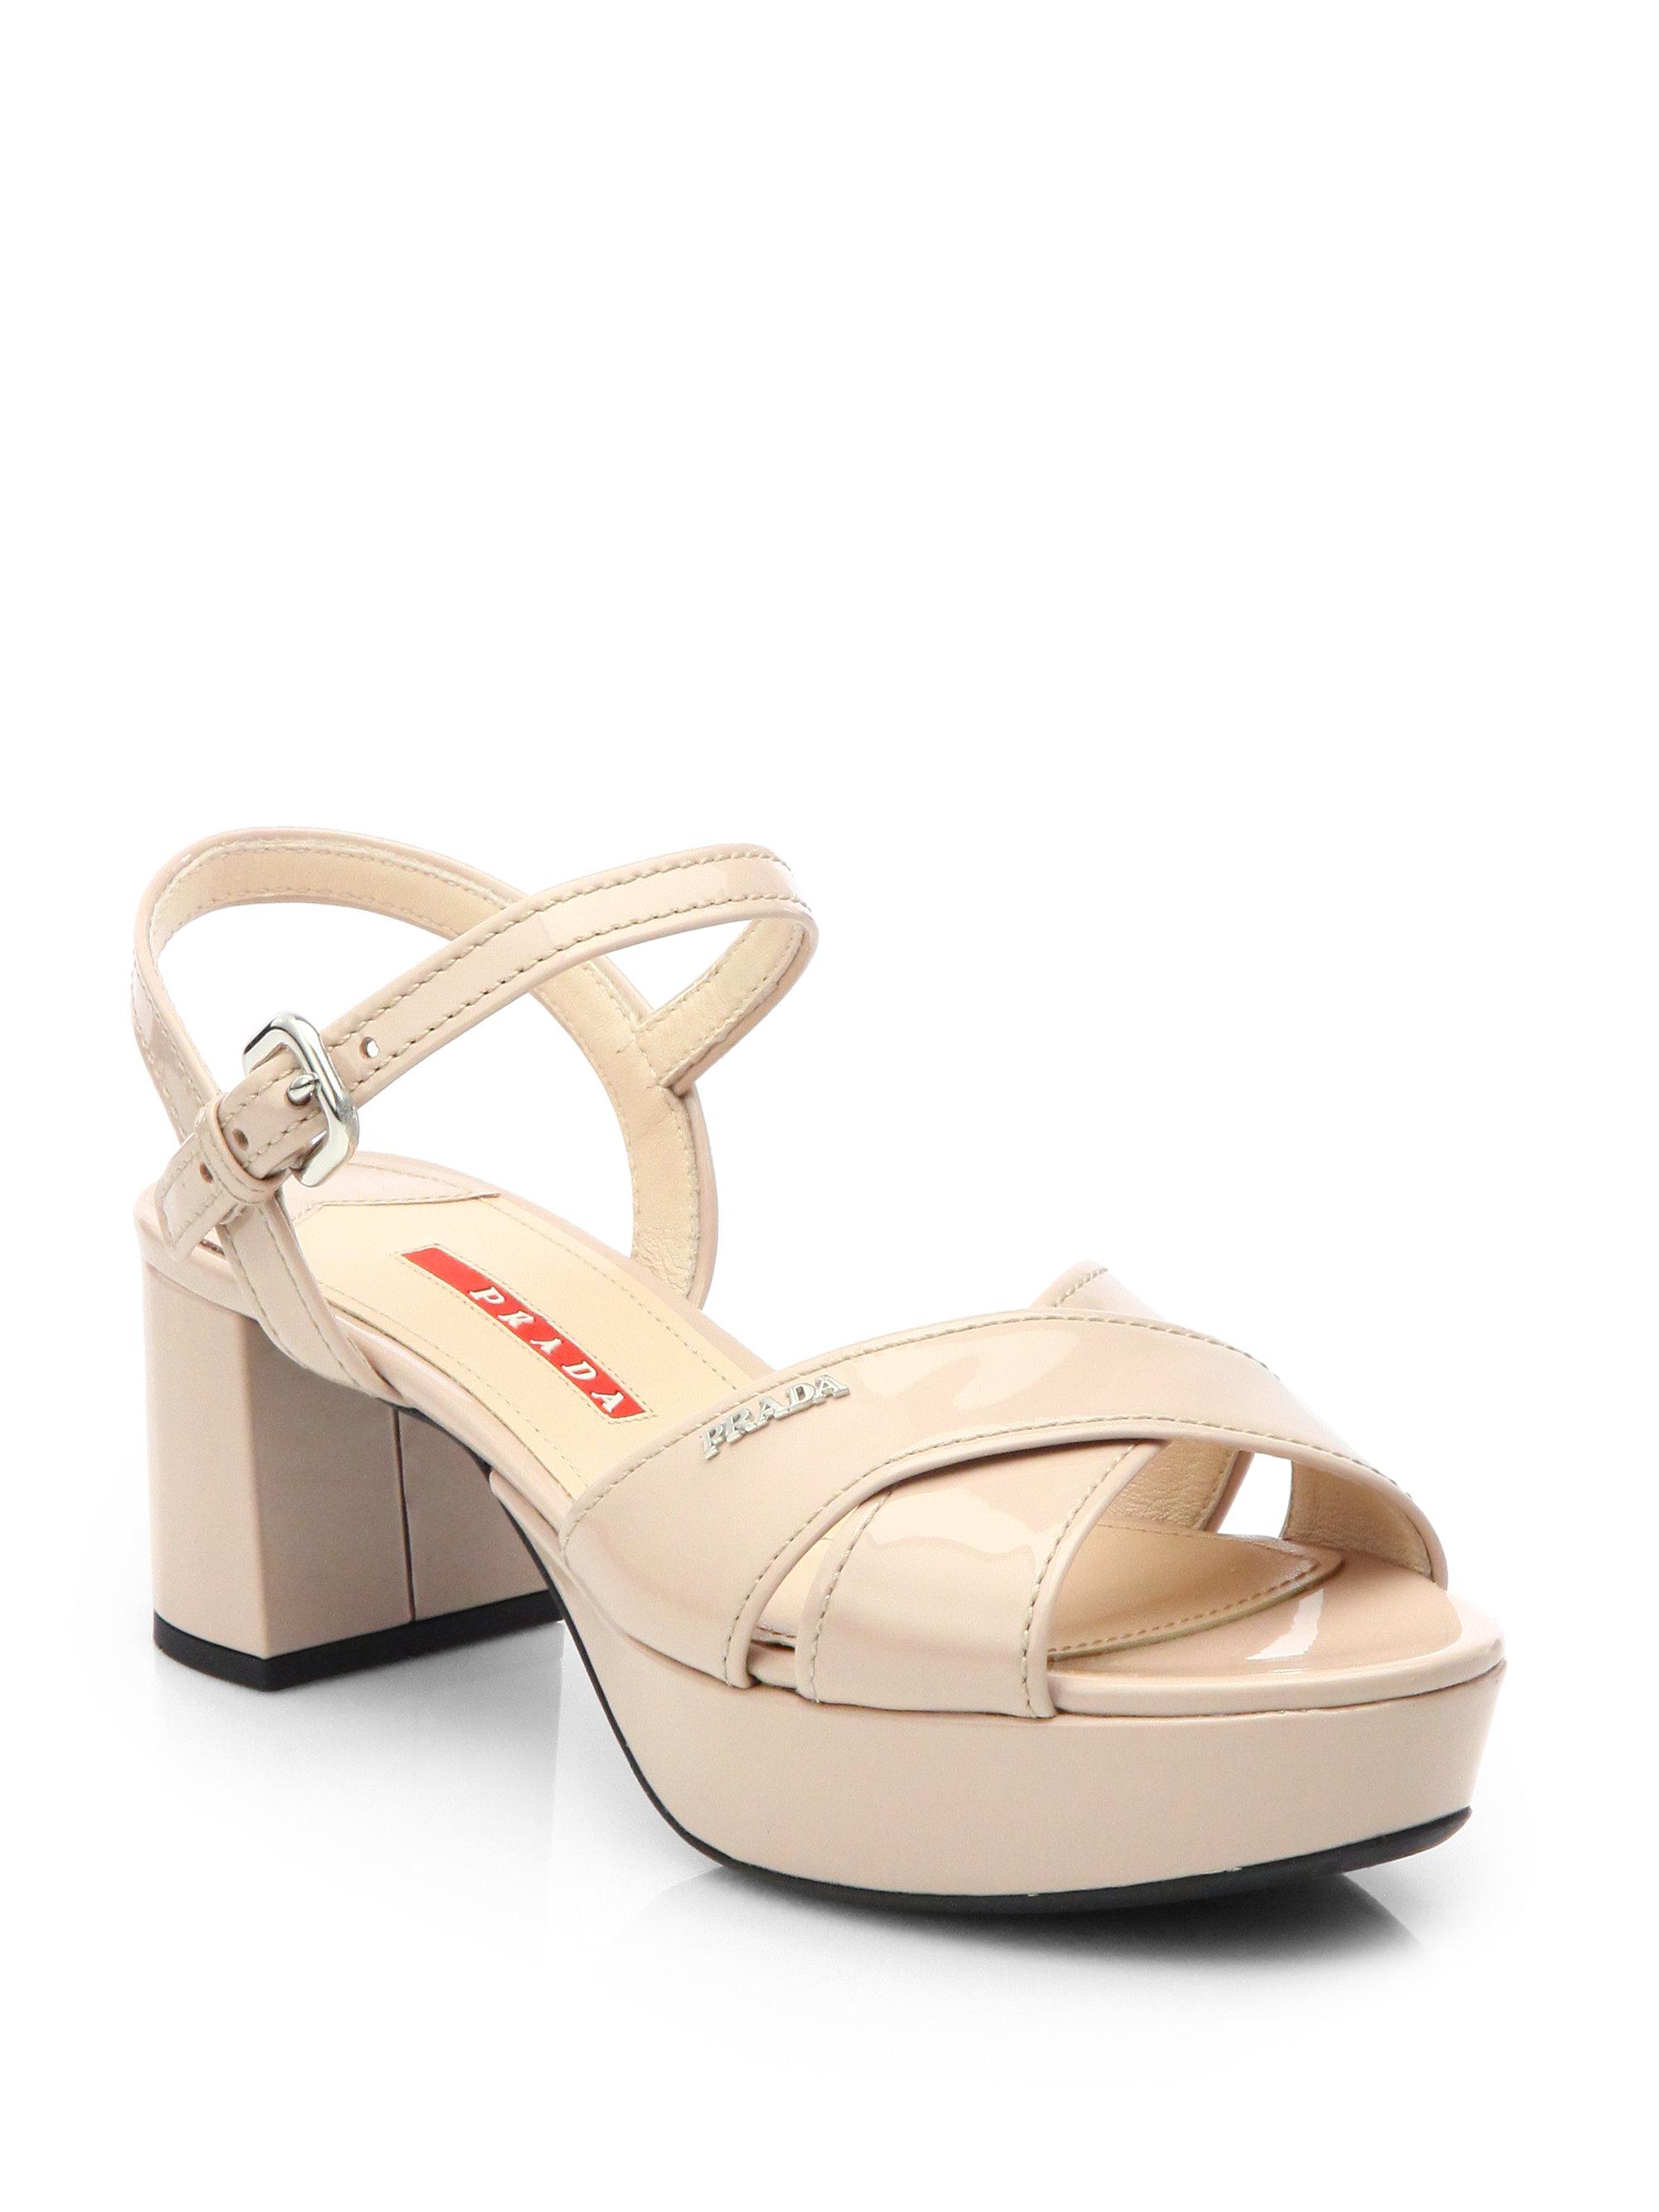 Prada Patent Leather Crisscross Platform Sandals in